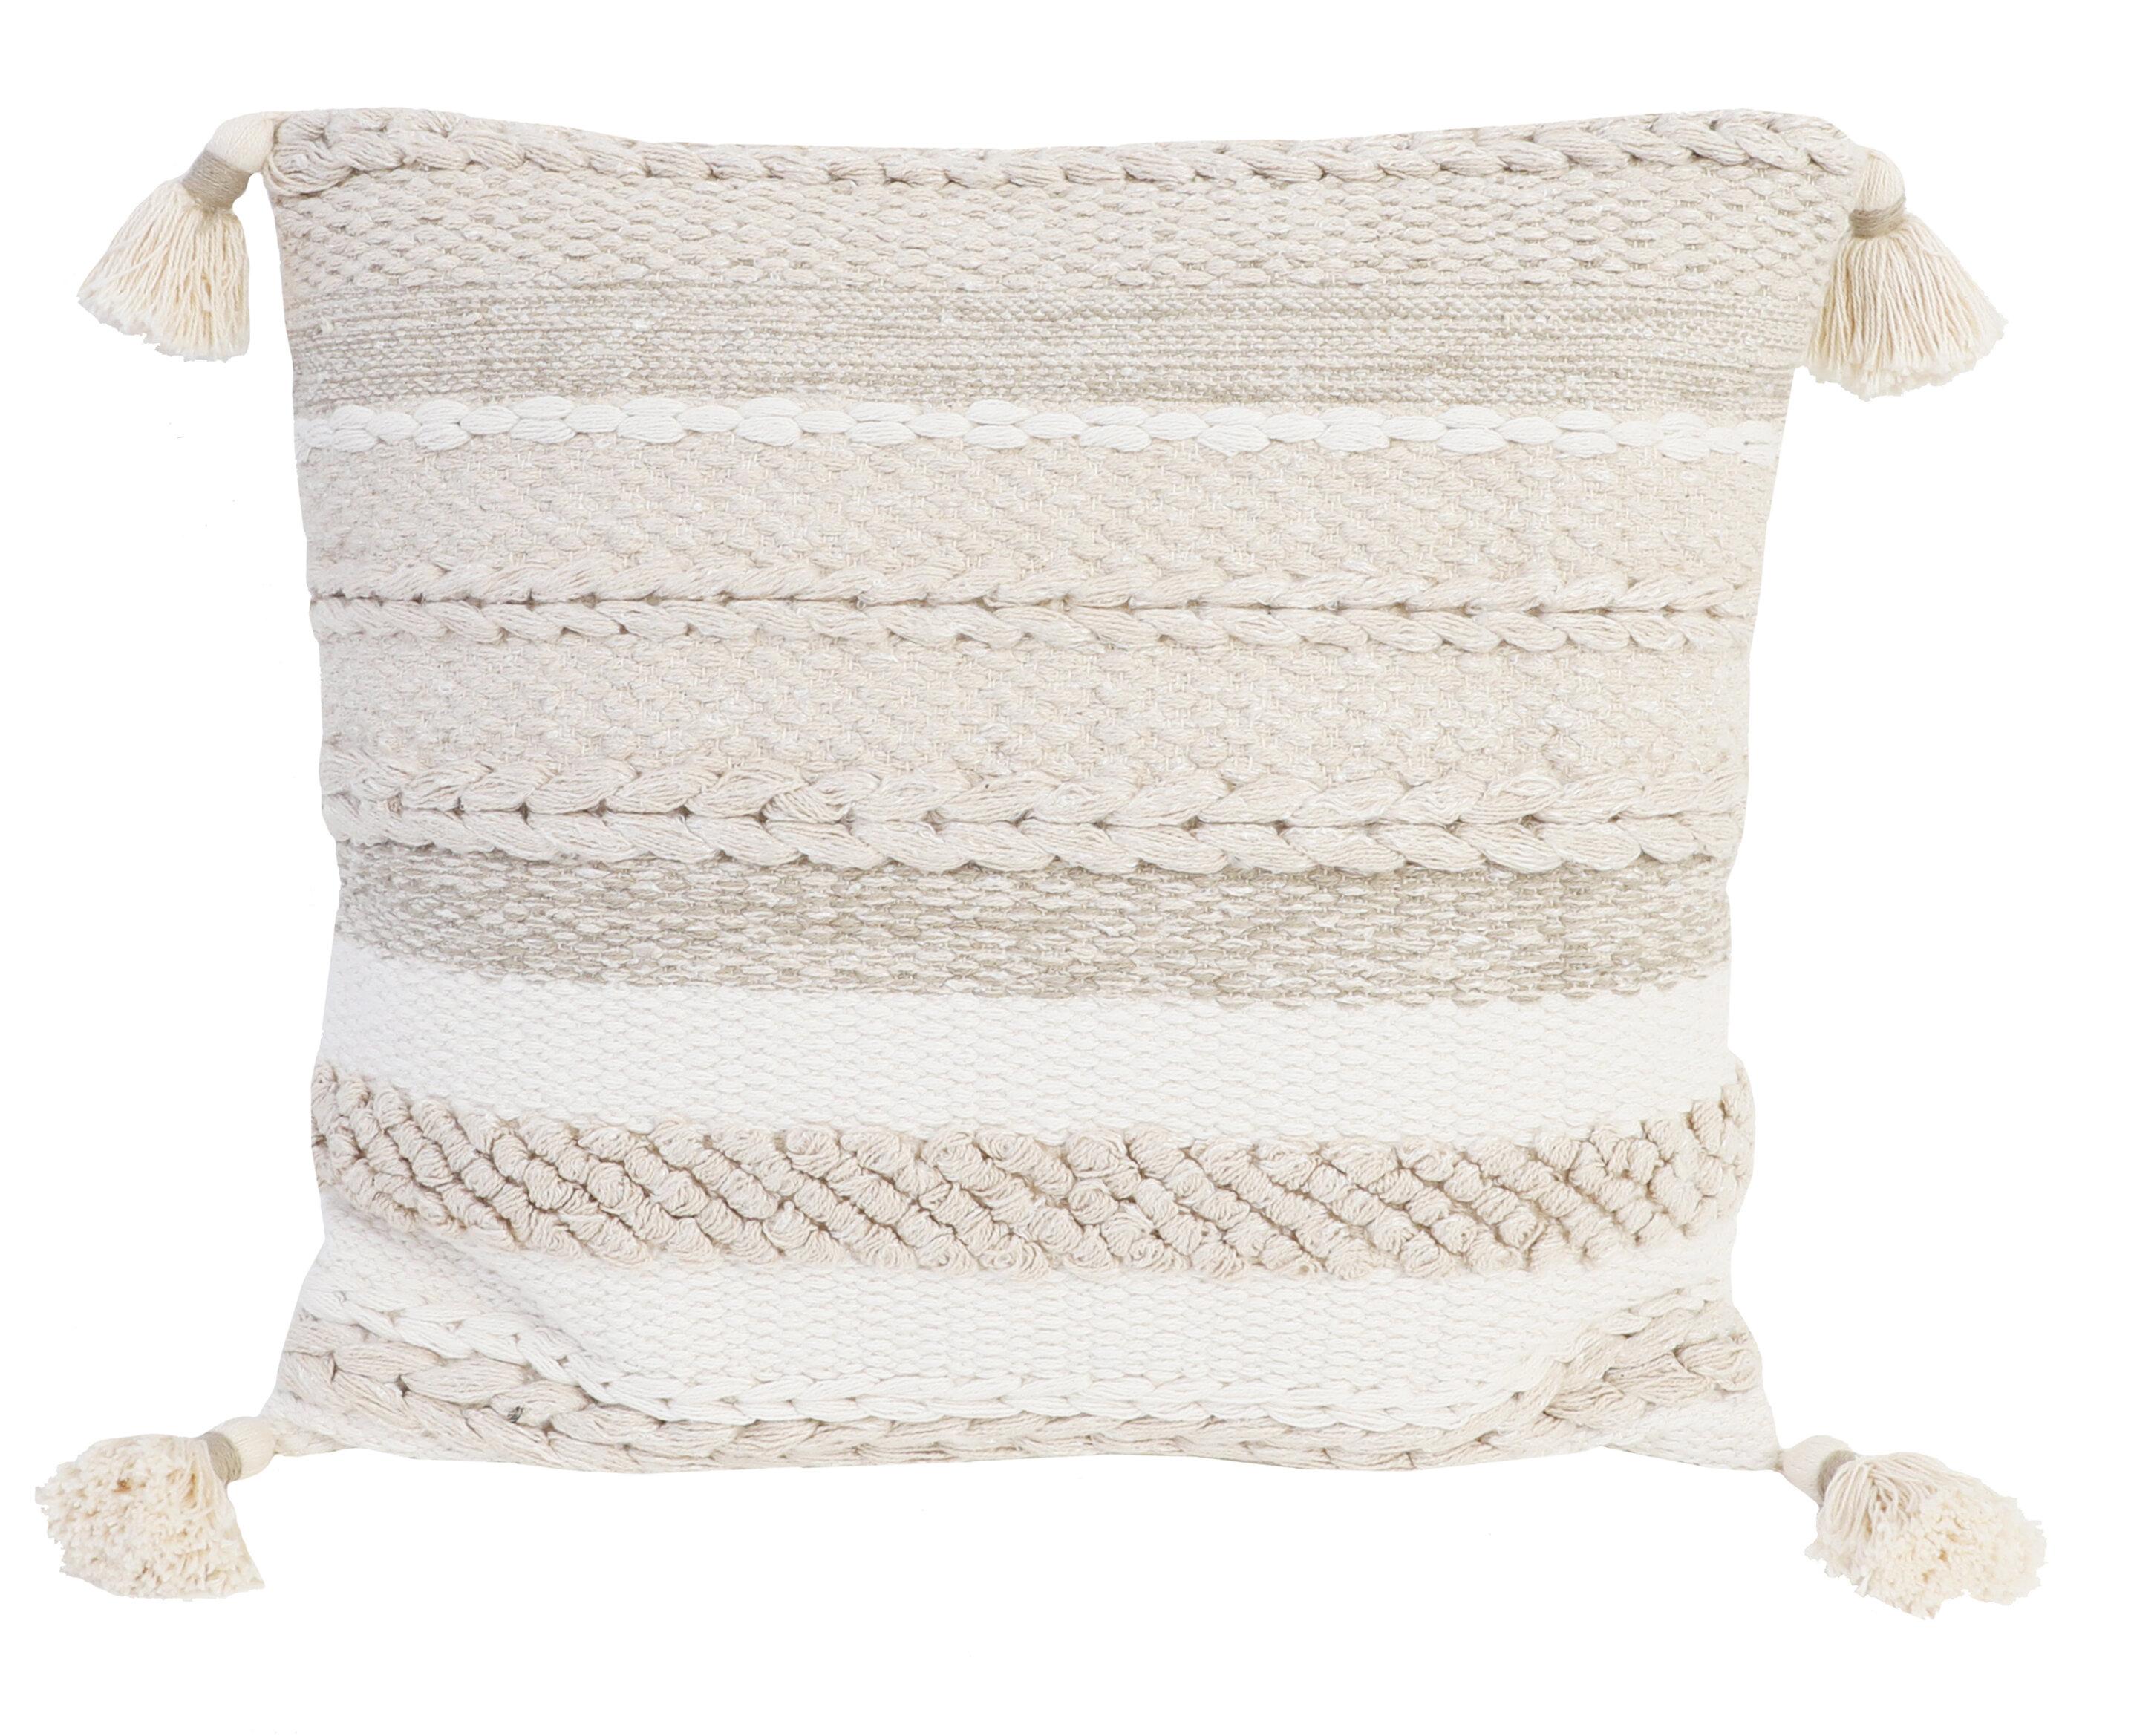 Mistana Penelope Cotton Feathers Striped Throw Pillow Reviews Wayfair